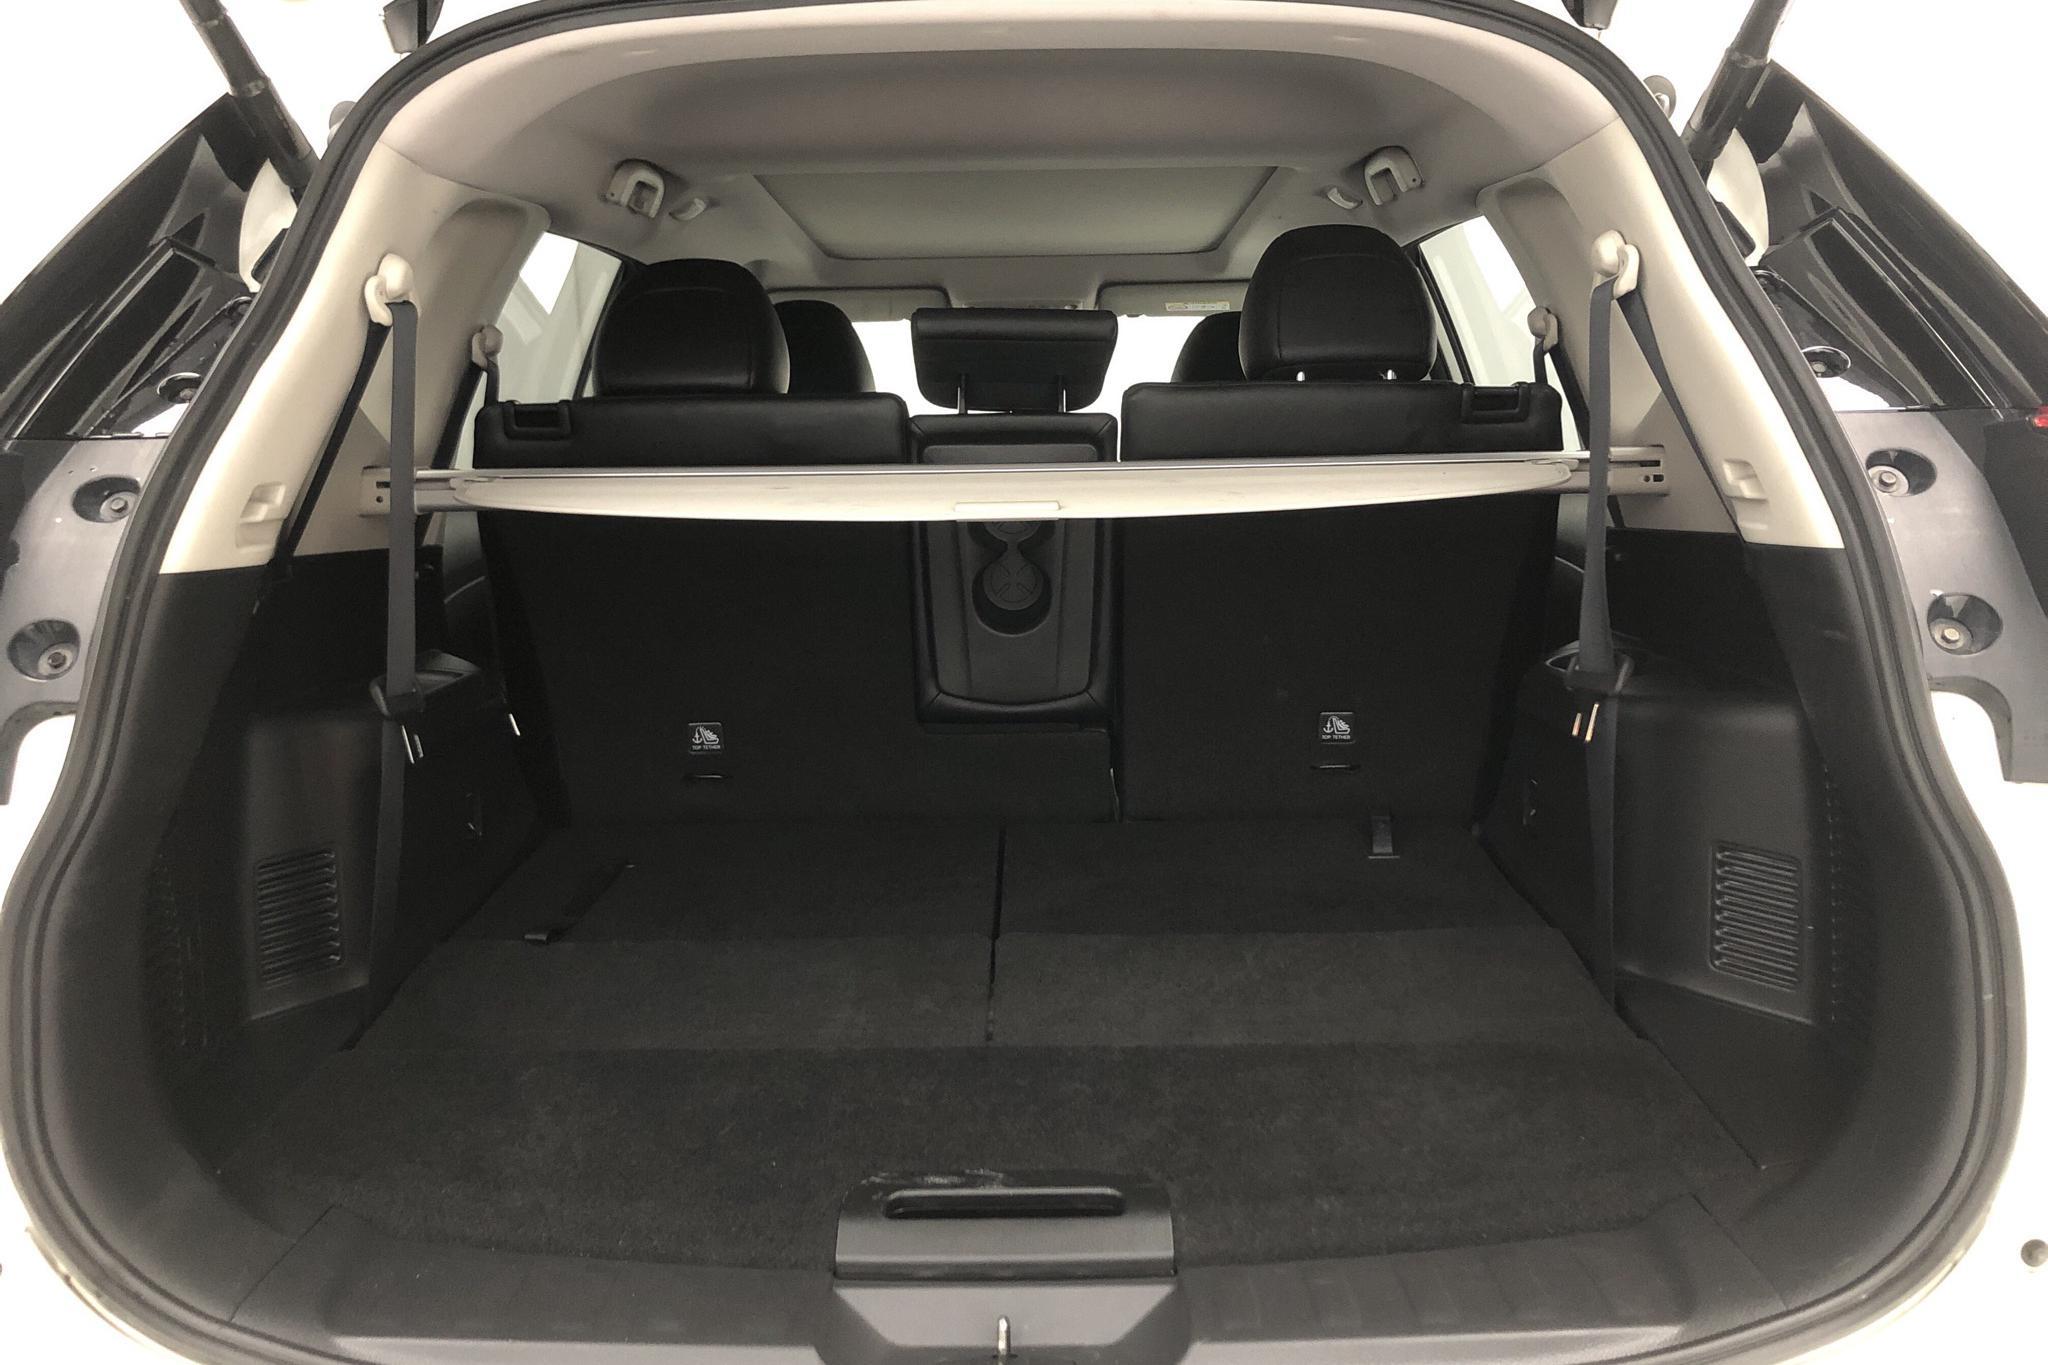 Nissan X-trail 1.6 dCi 2WD (130hk) - 50 410 km - Automatic - white - 2017